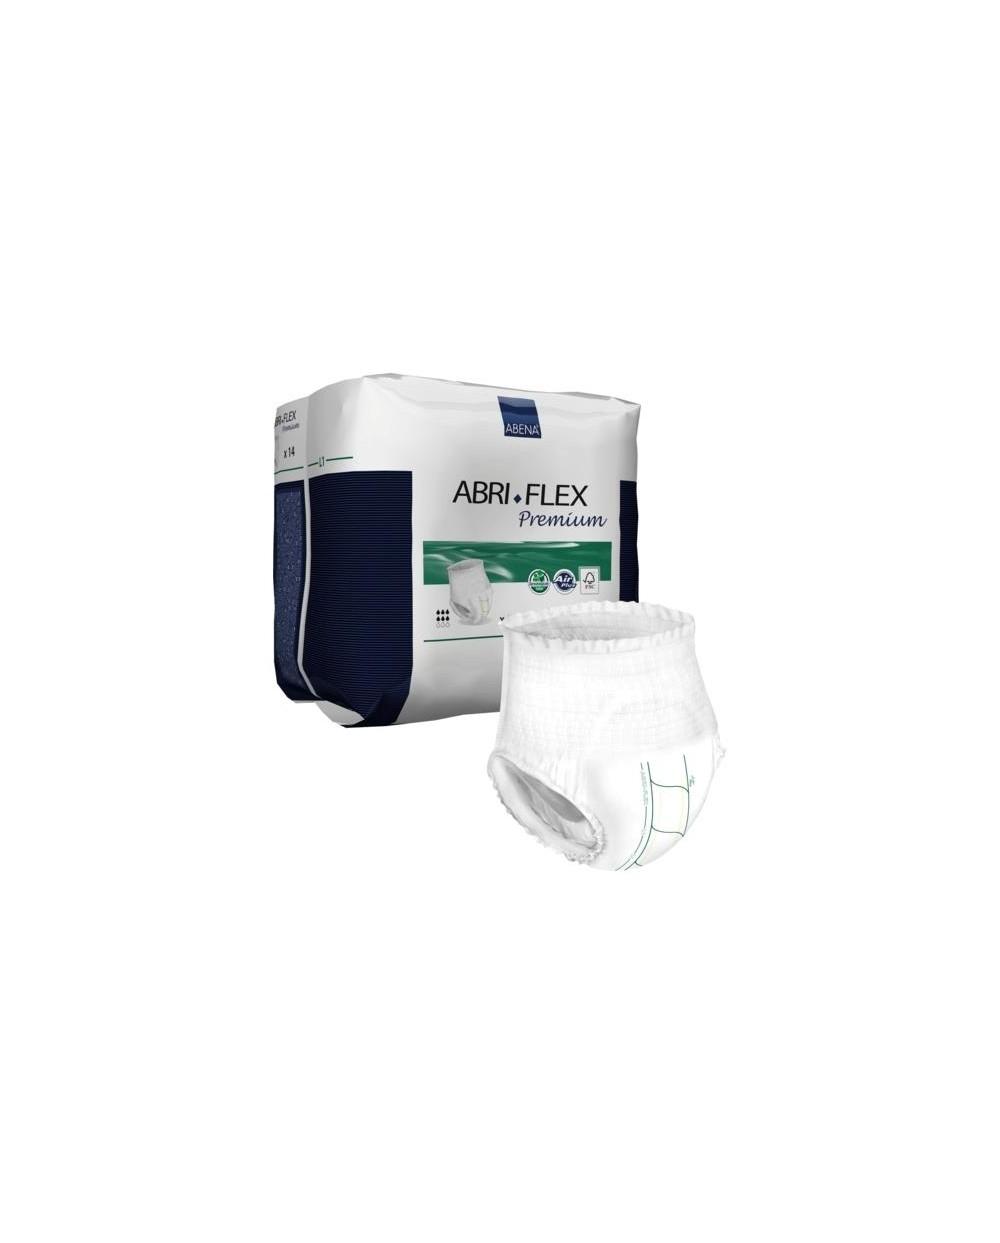 Abena Abri-Flex 1 Large - 14 protections